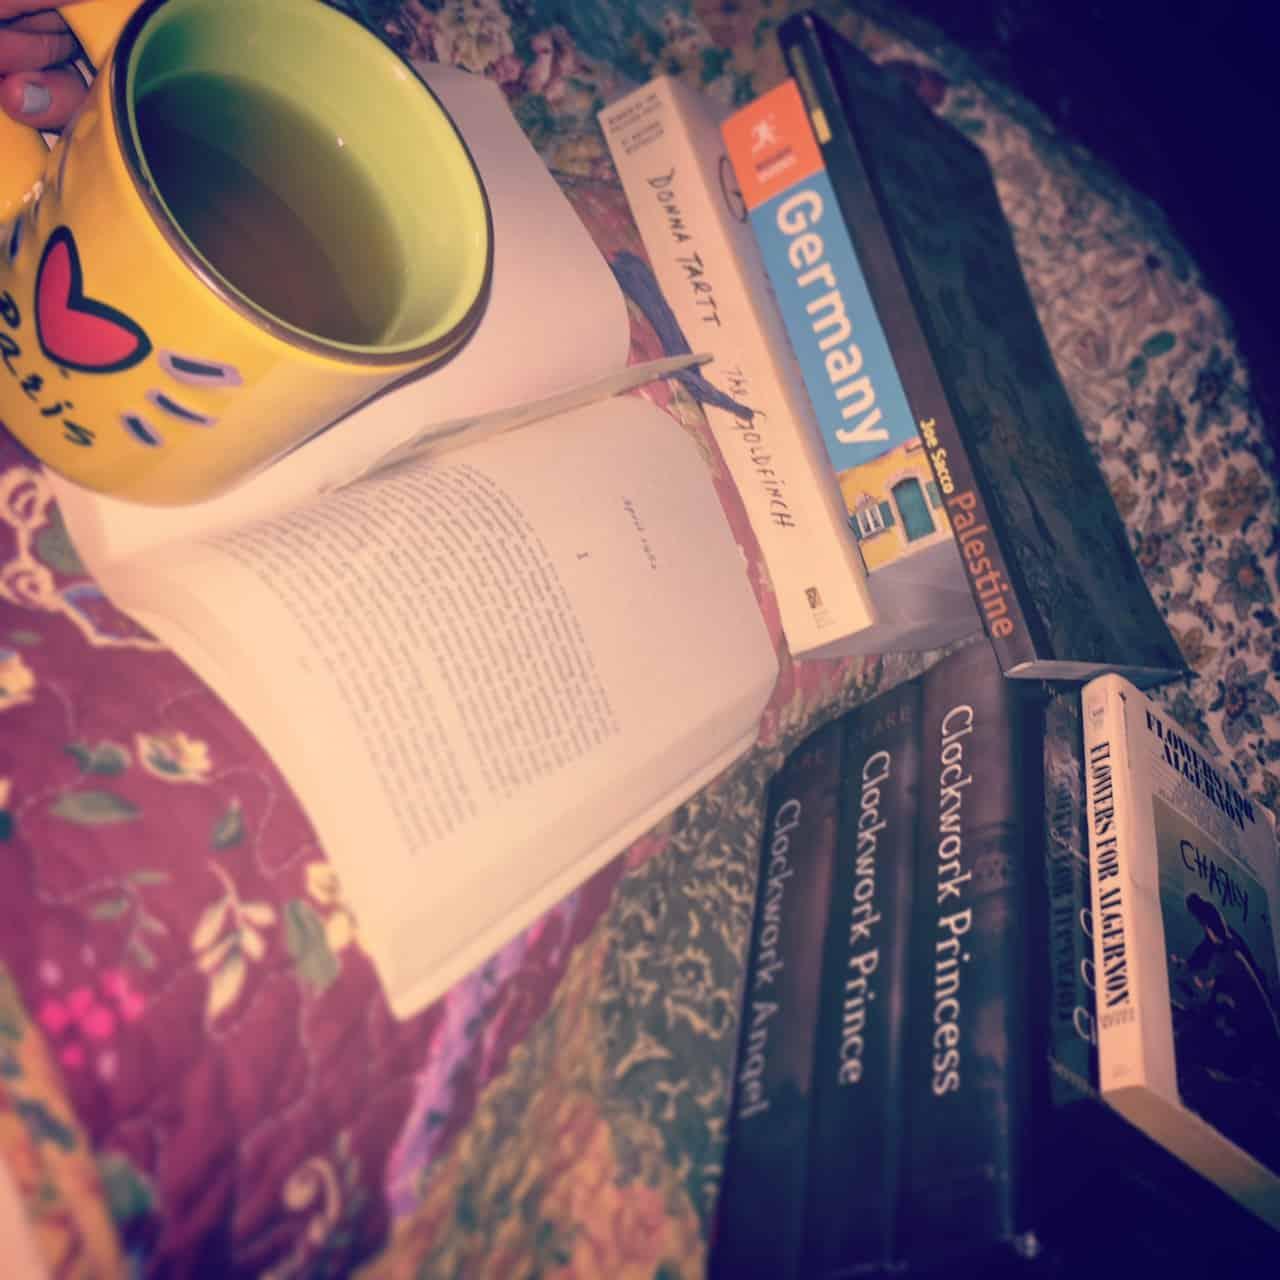 sleeping with big books